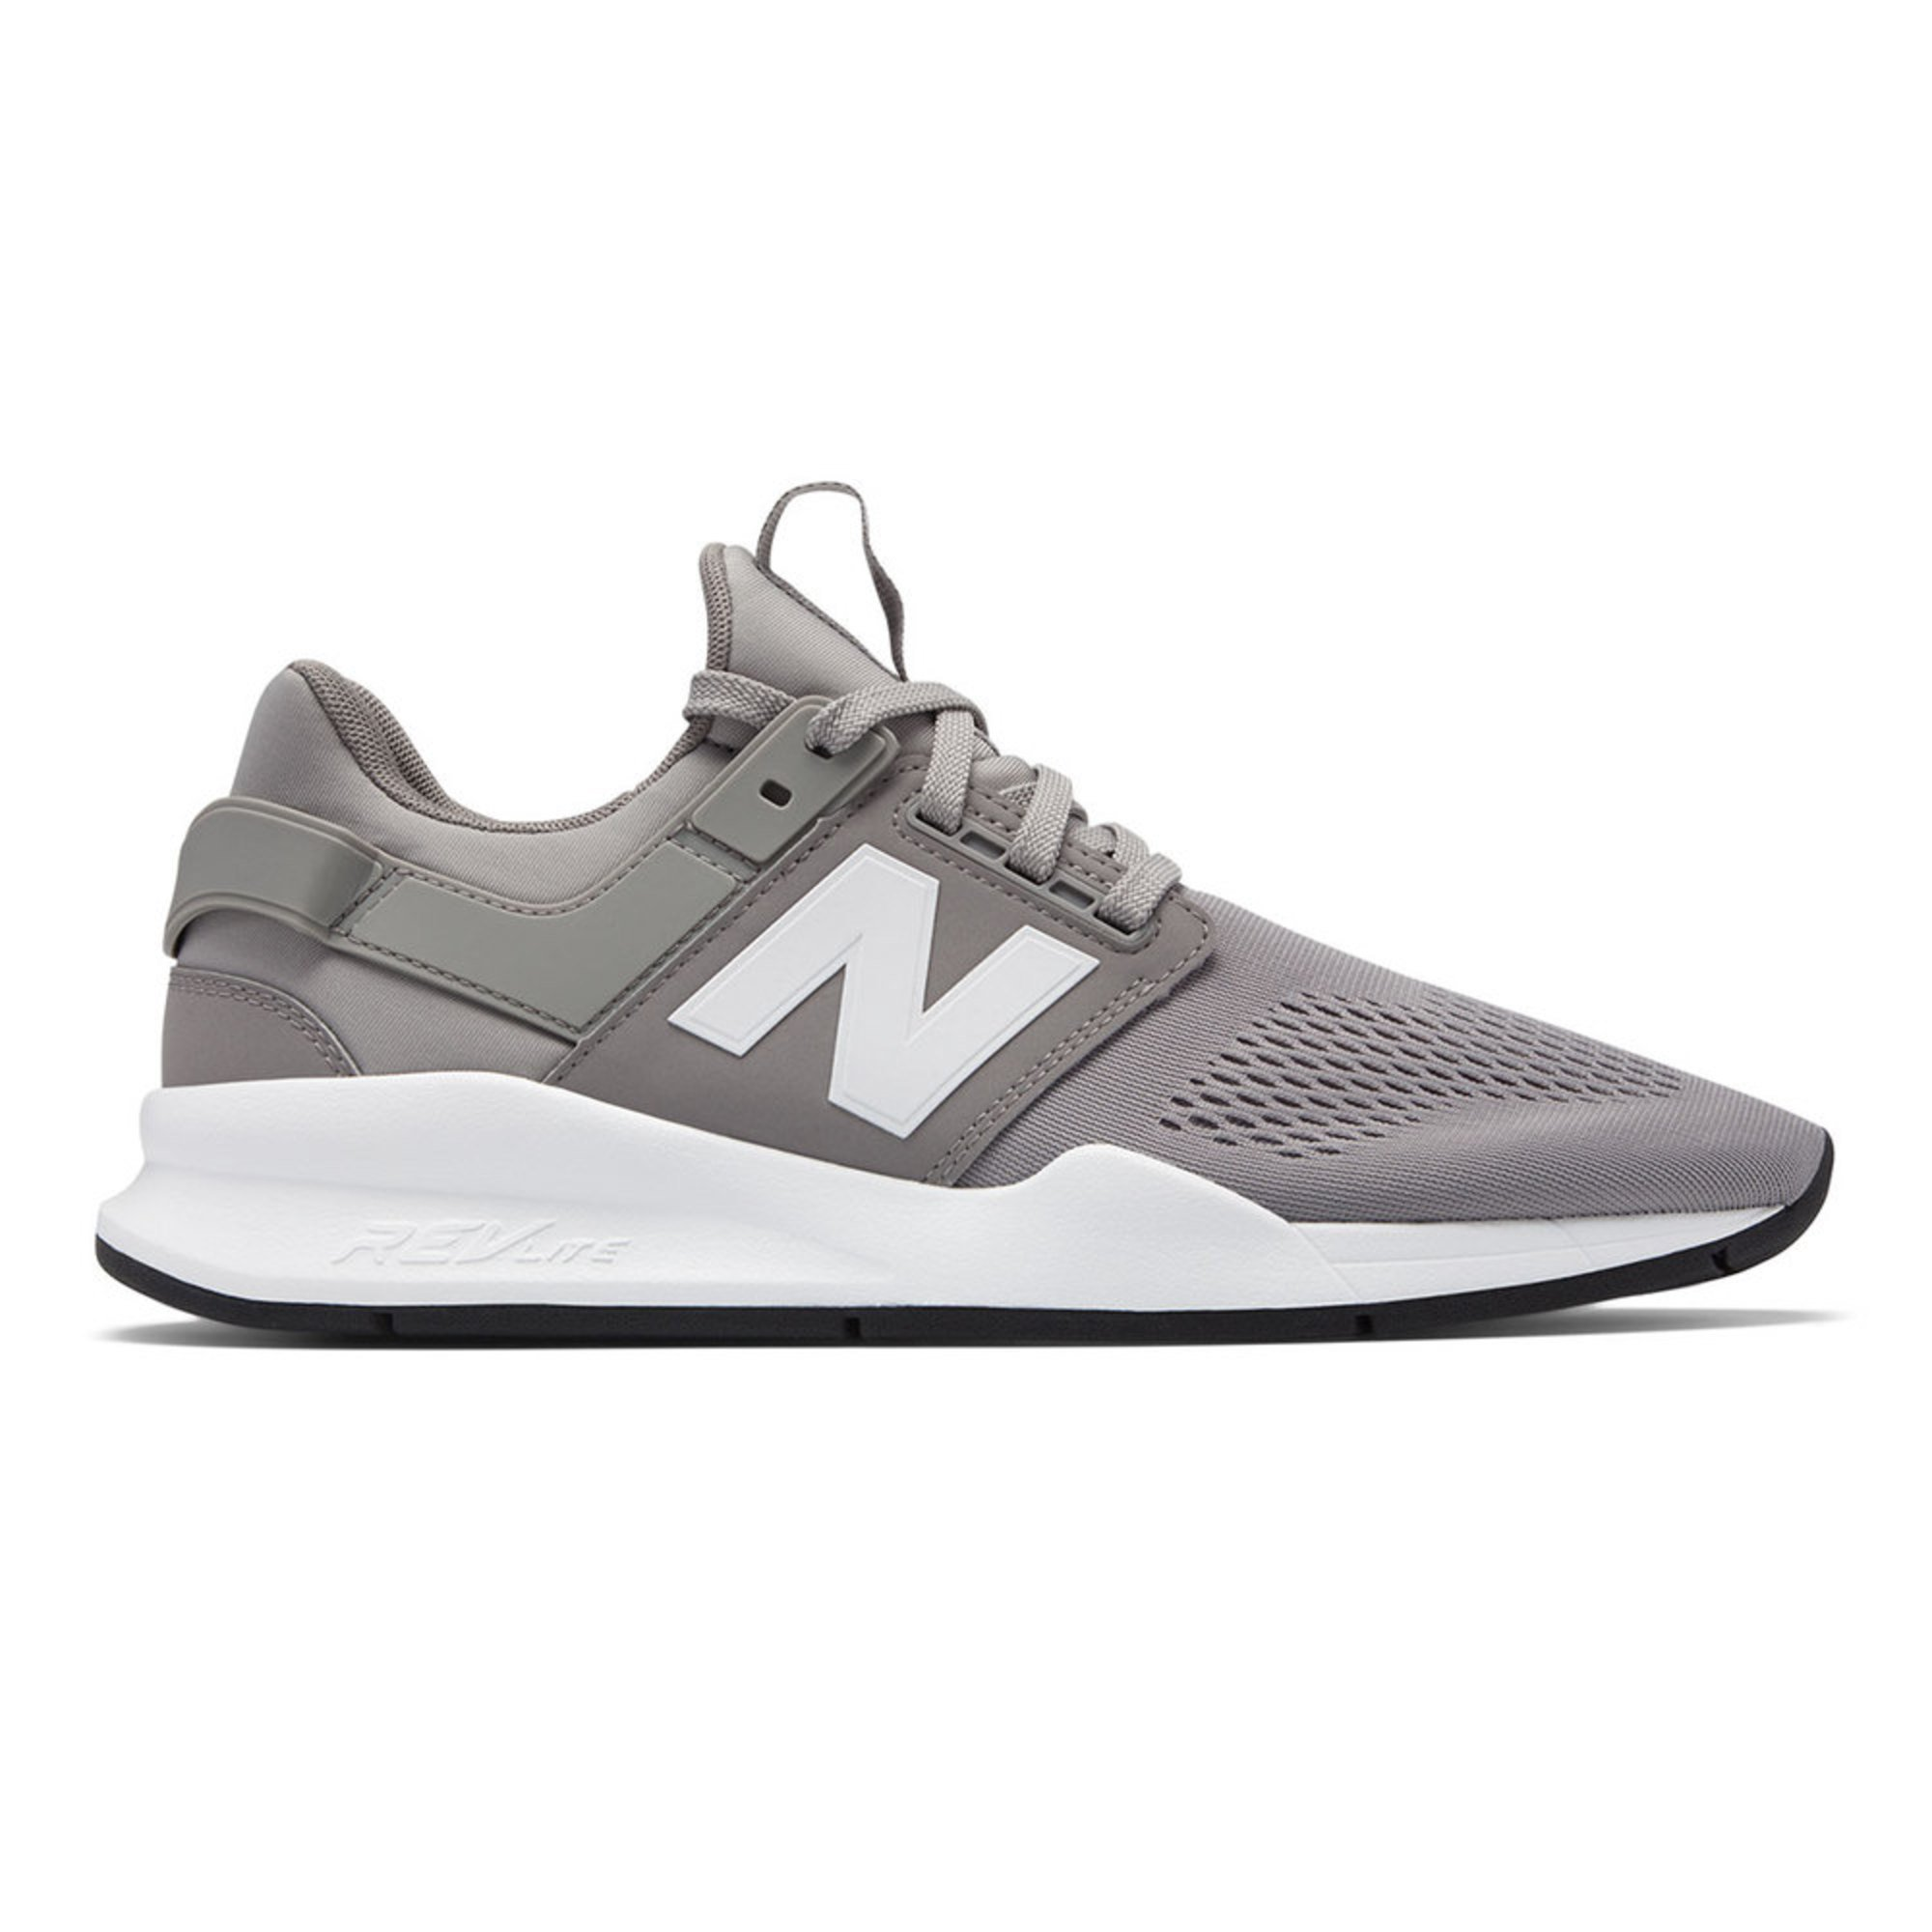 c3f989f9b5e New Balance Men s 247v2 Lifestyle Shoe